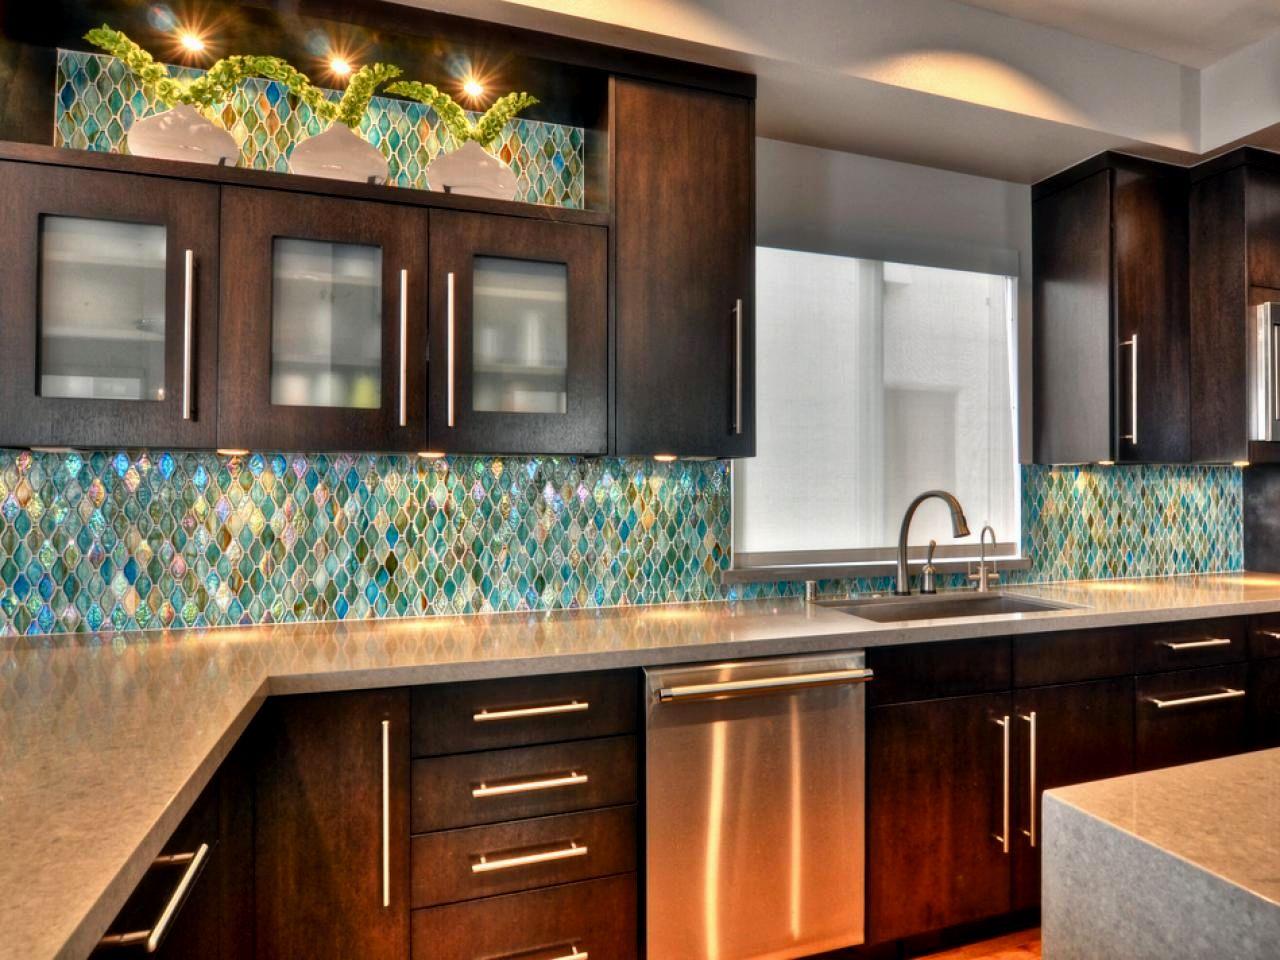 beautiful home depot bathroom vent design-Awesome Home Depot Bathroom Vent Ideas